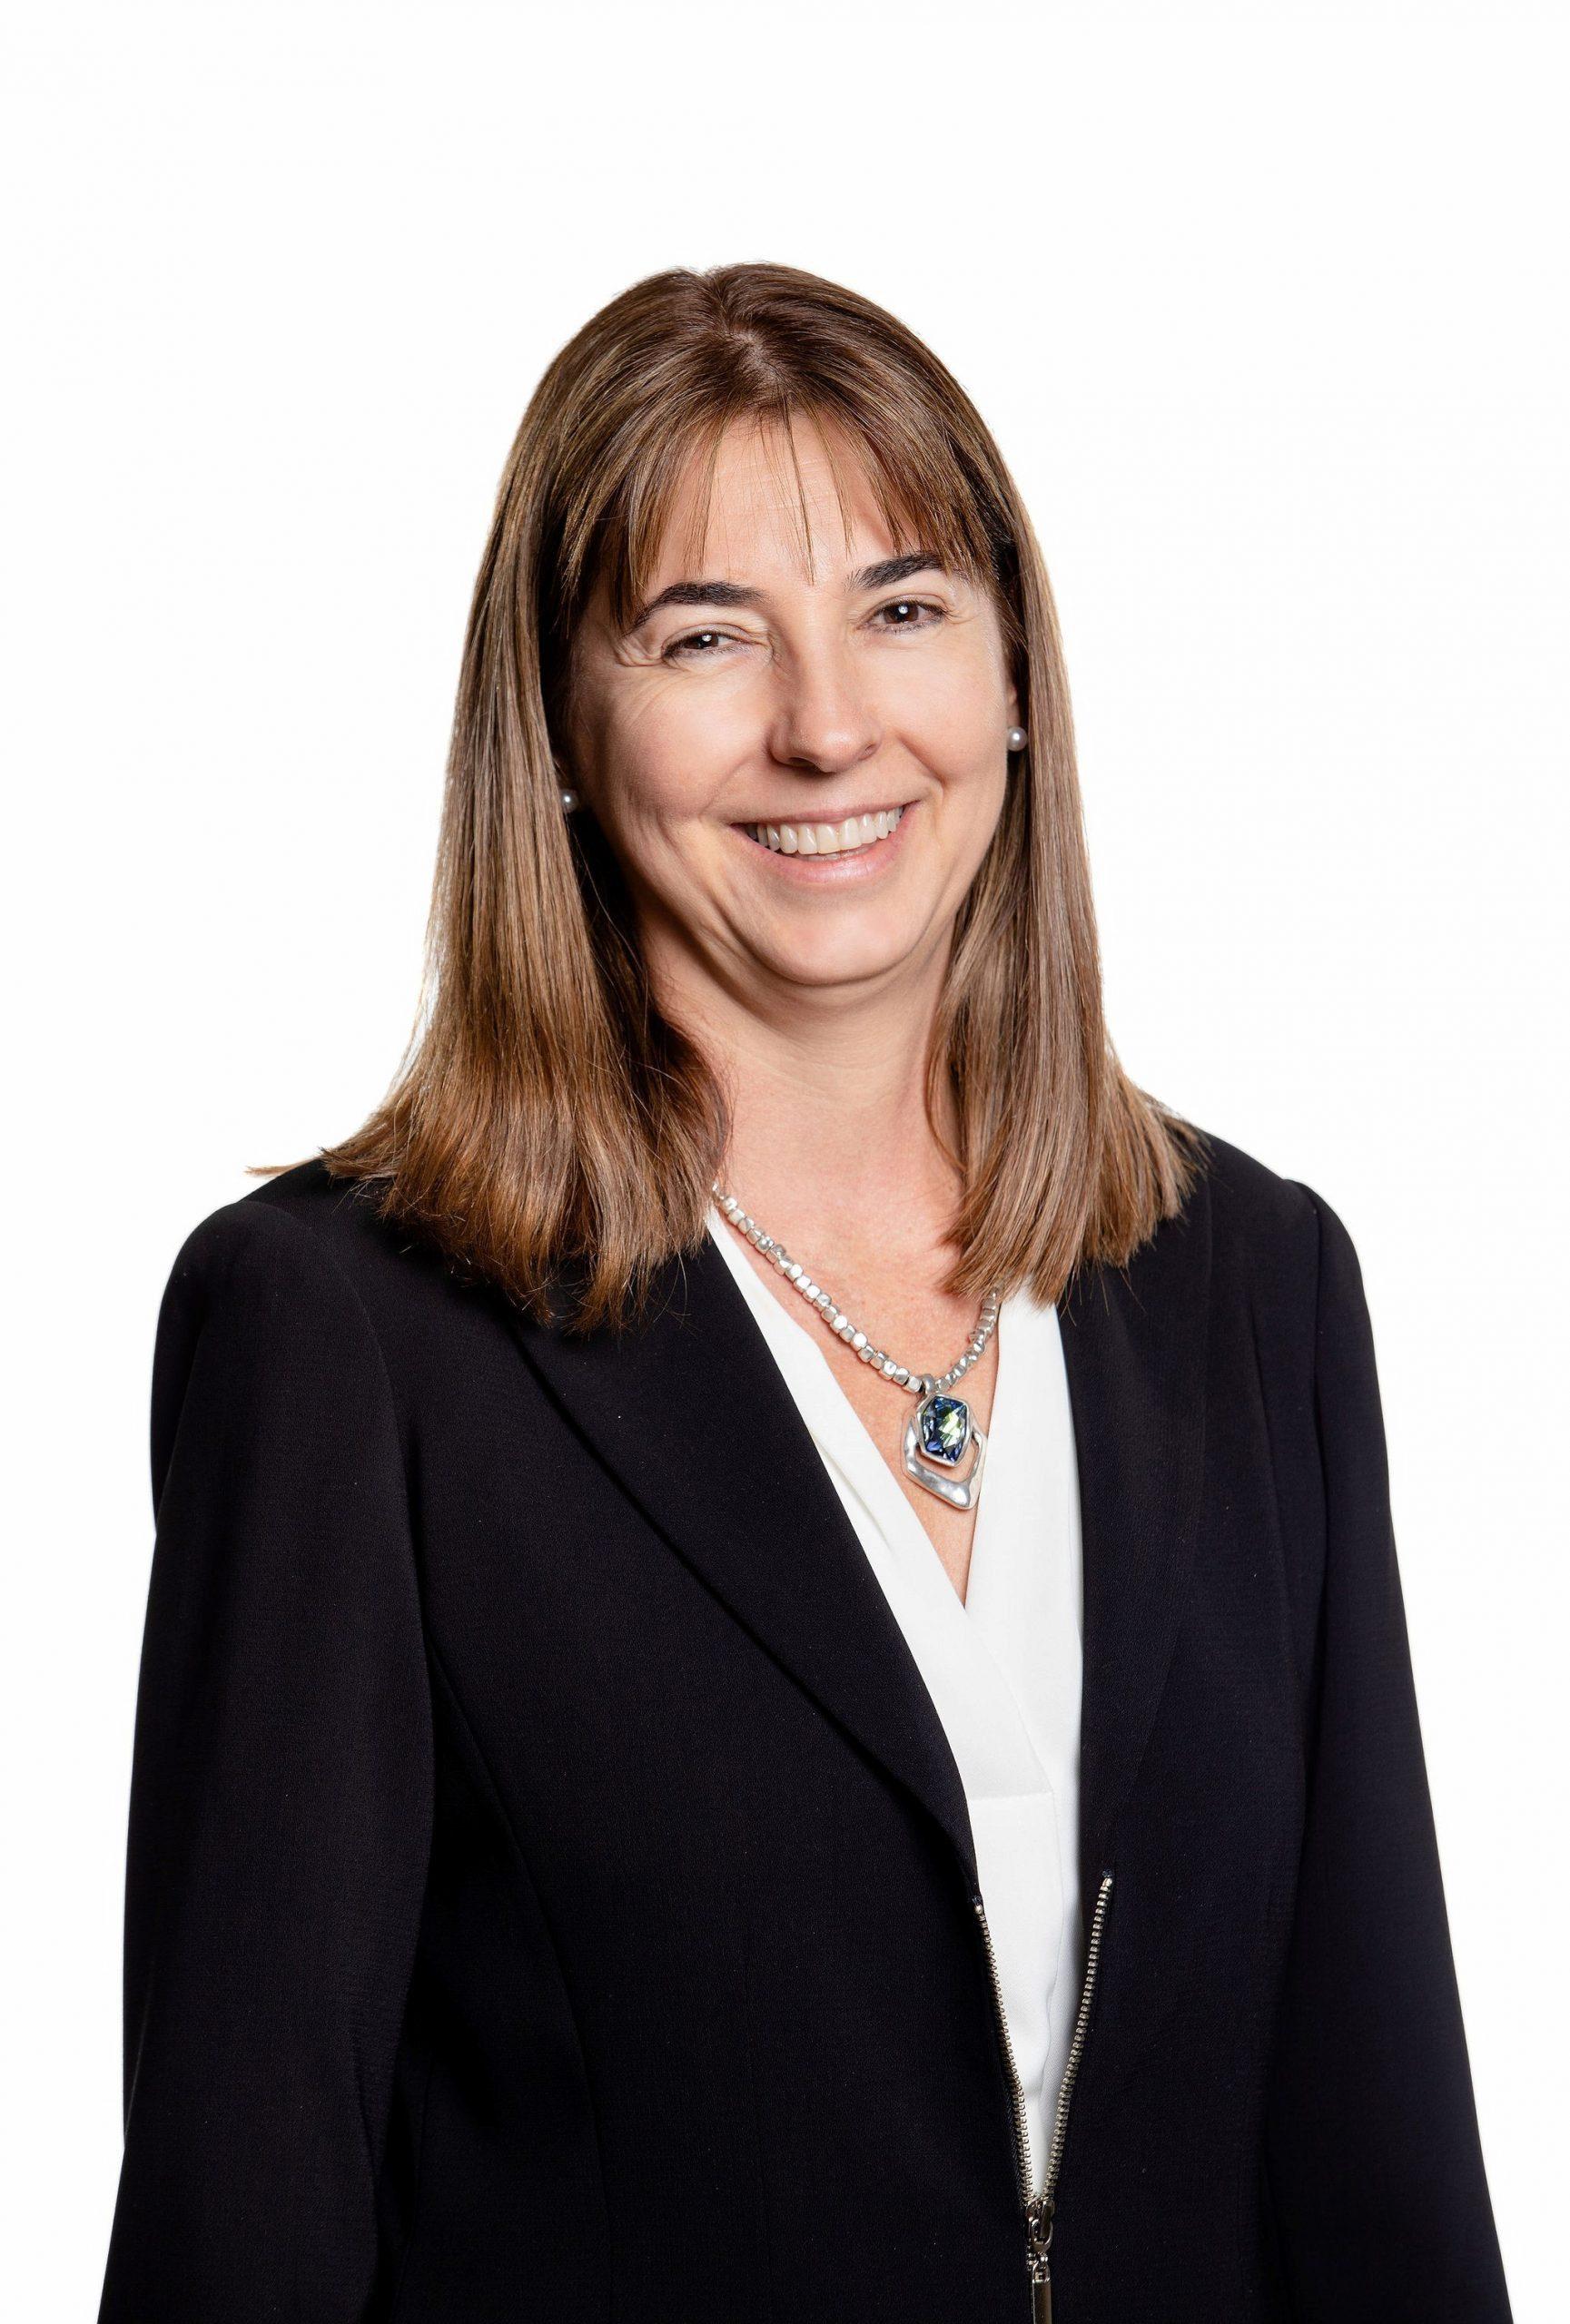 Cristina Arrastía - Vicepresidenta de Negocios de Bancolombia